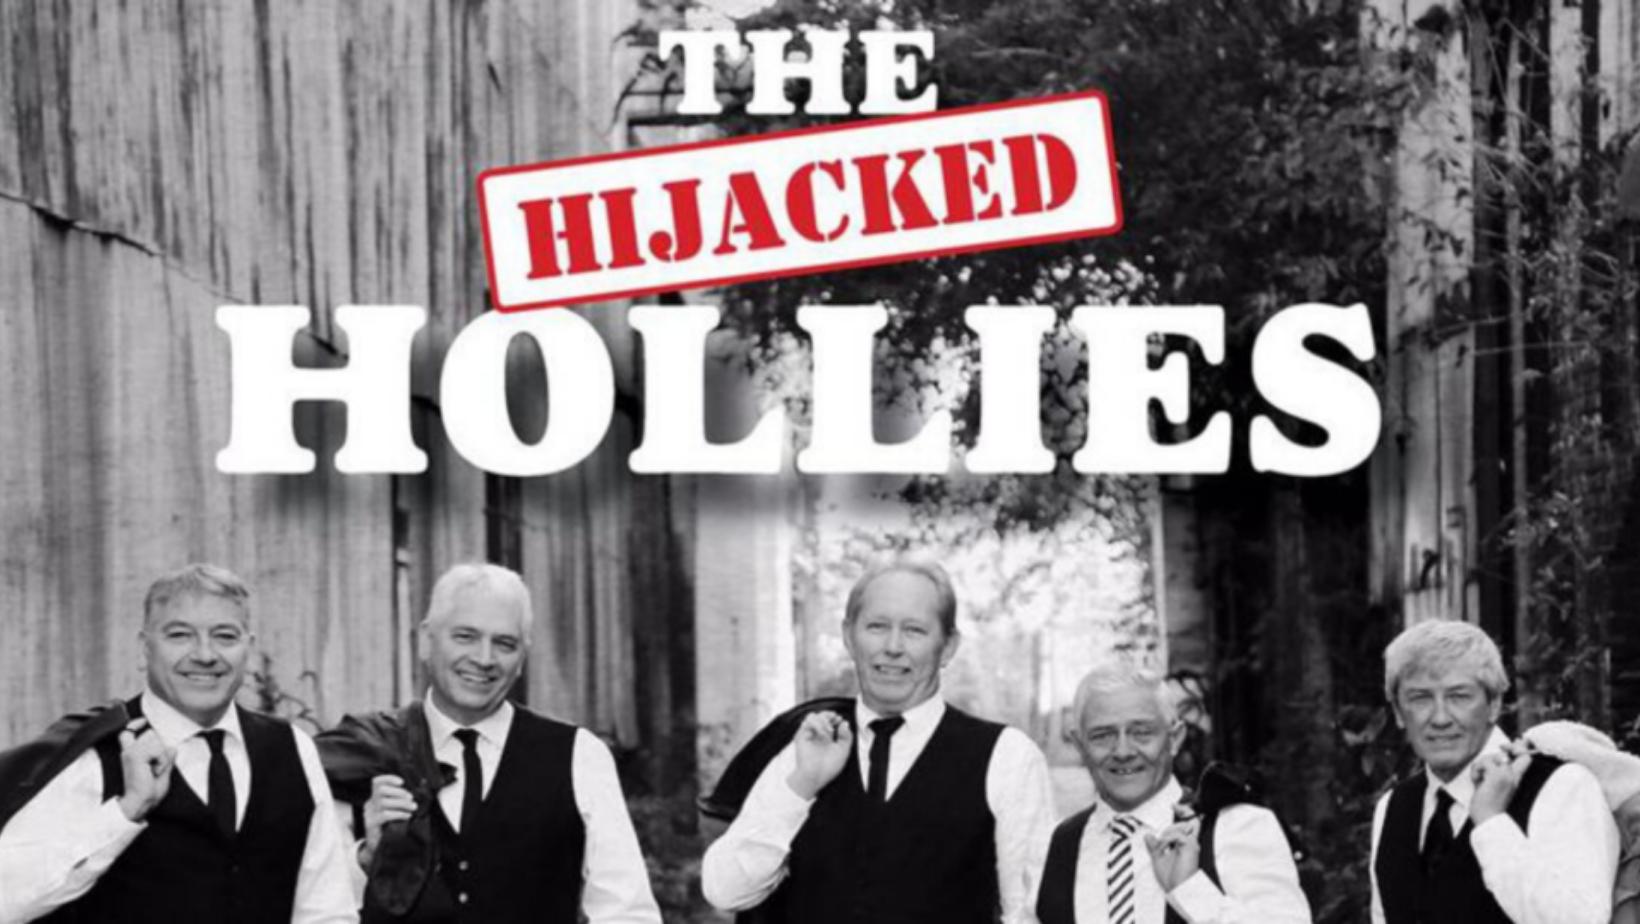 The Hijacked Hollies Logo